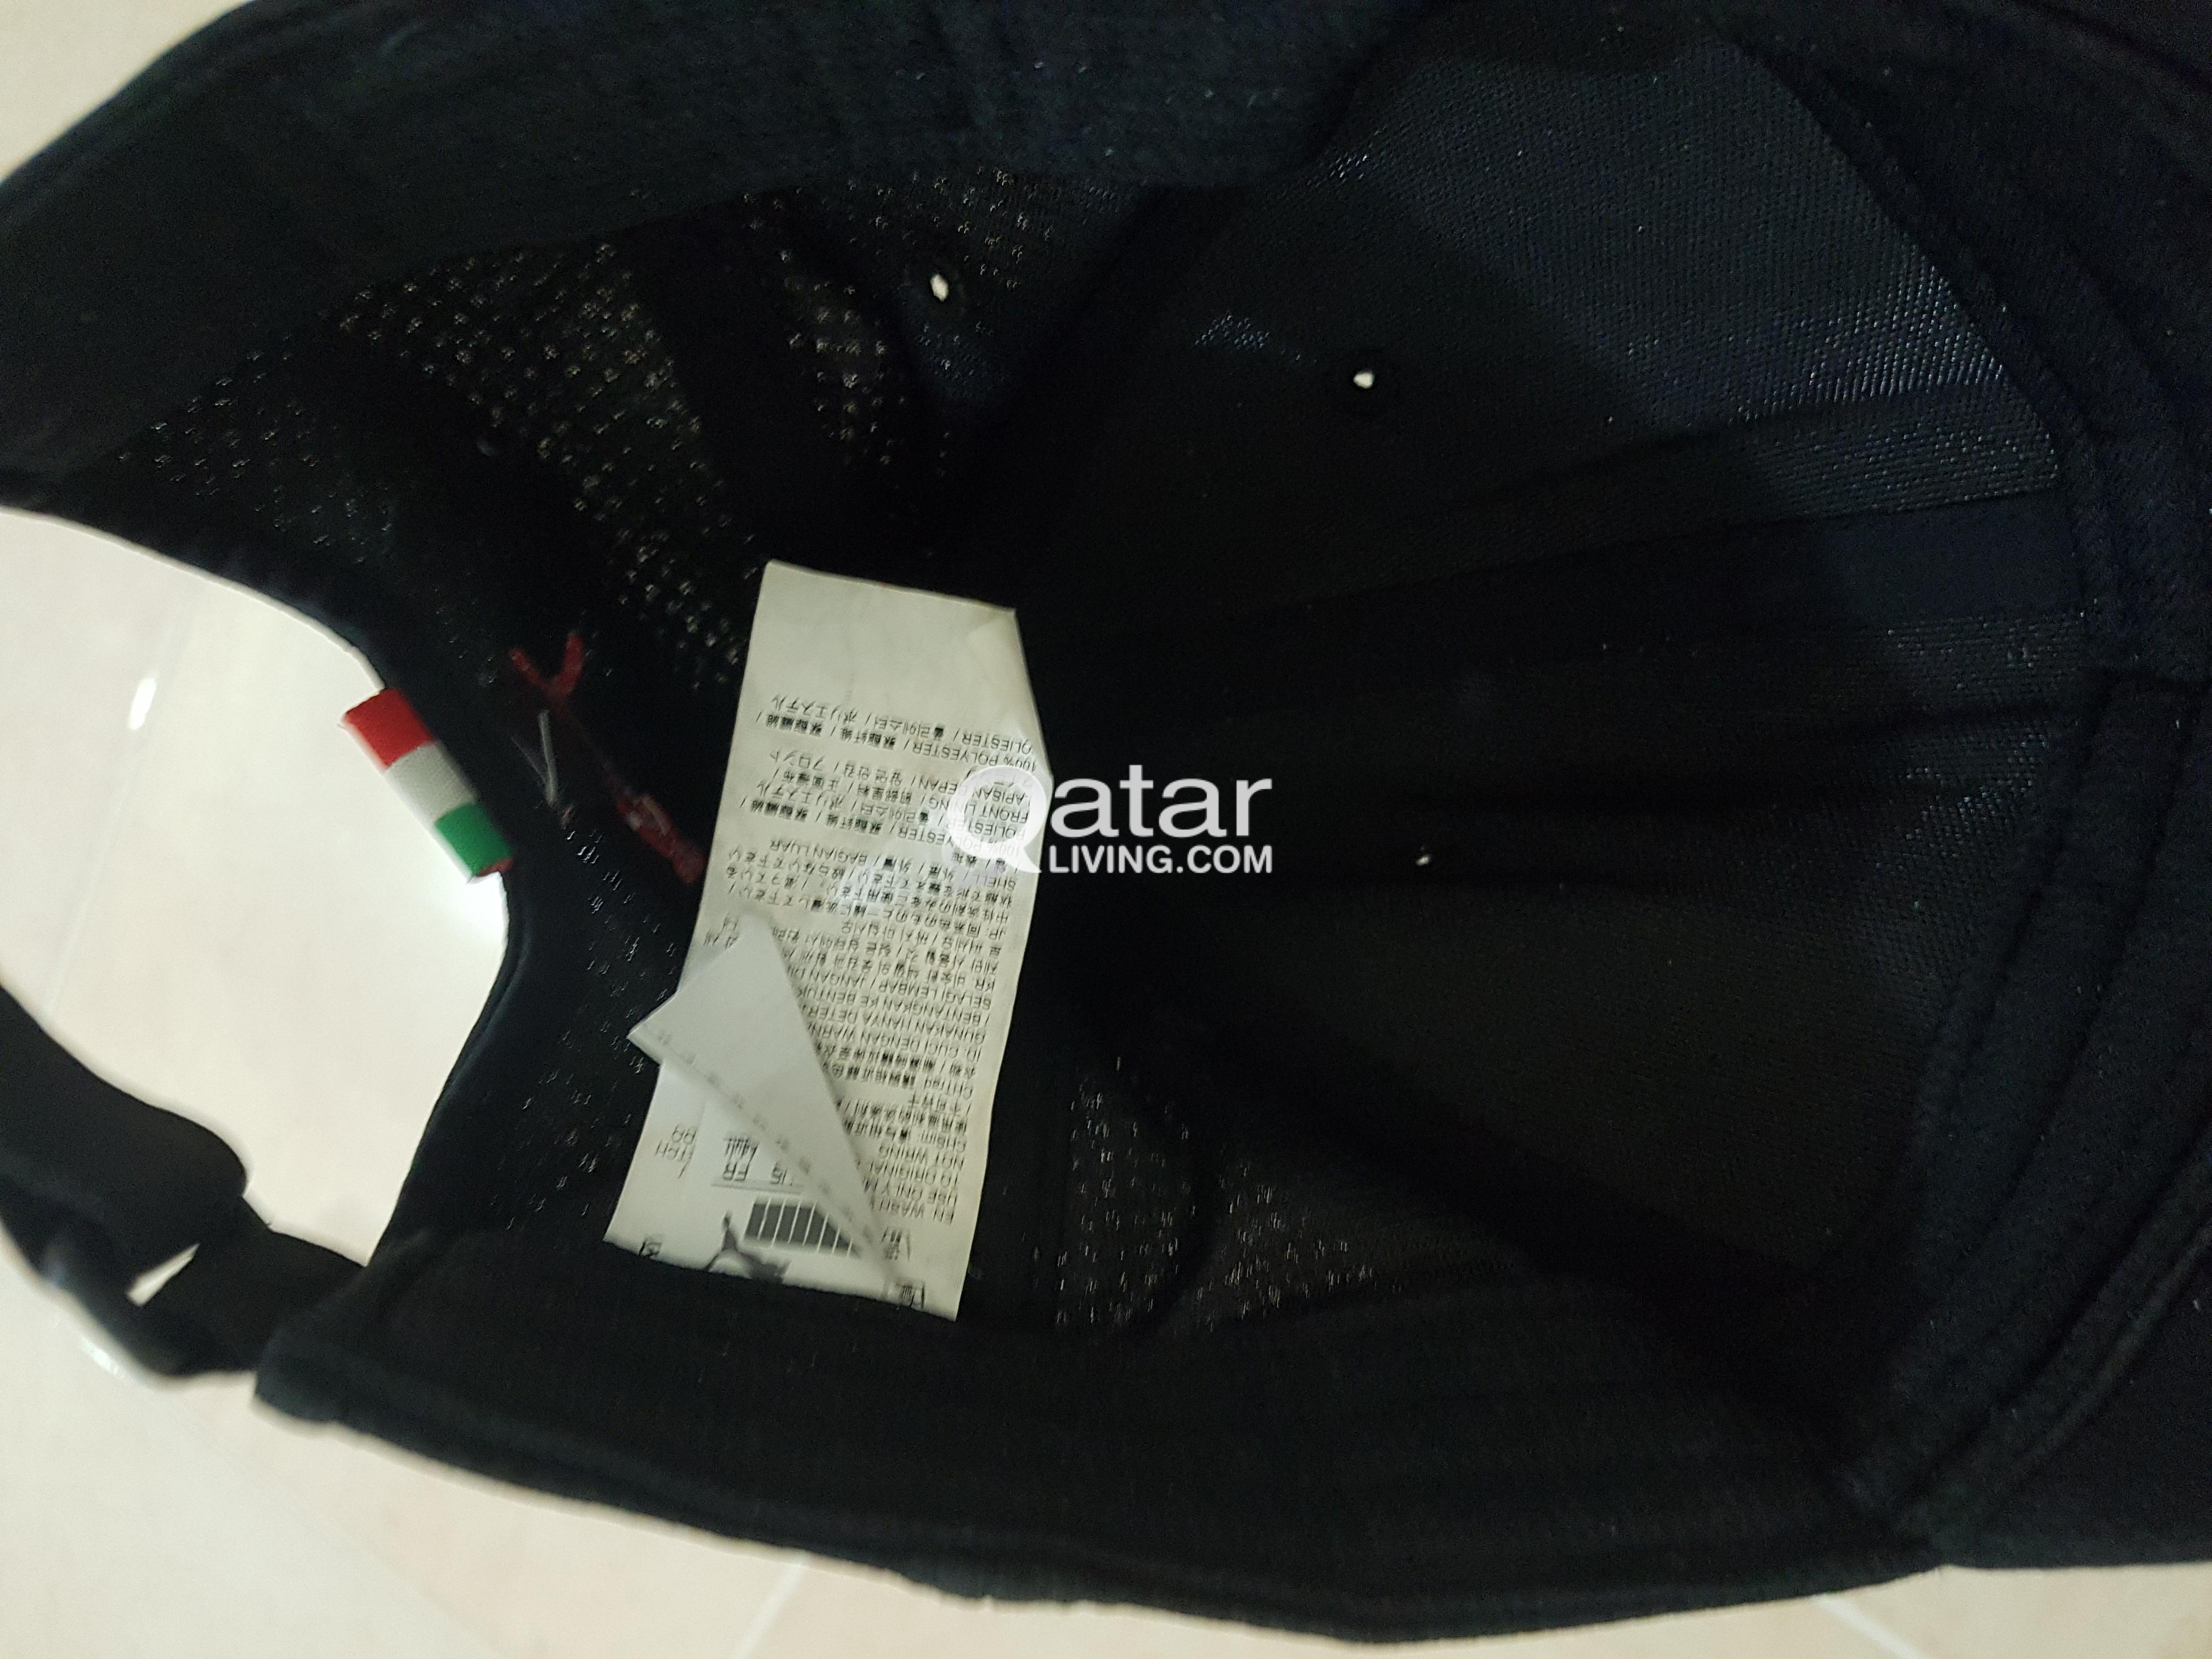 0a4f97e3 Puma Ferrari Cap | Qatar Living